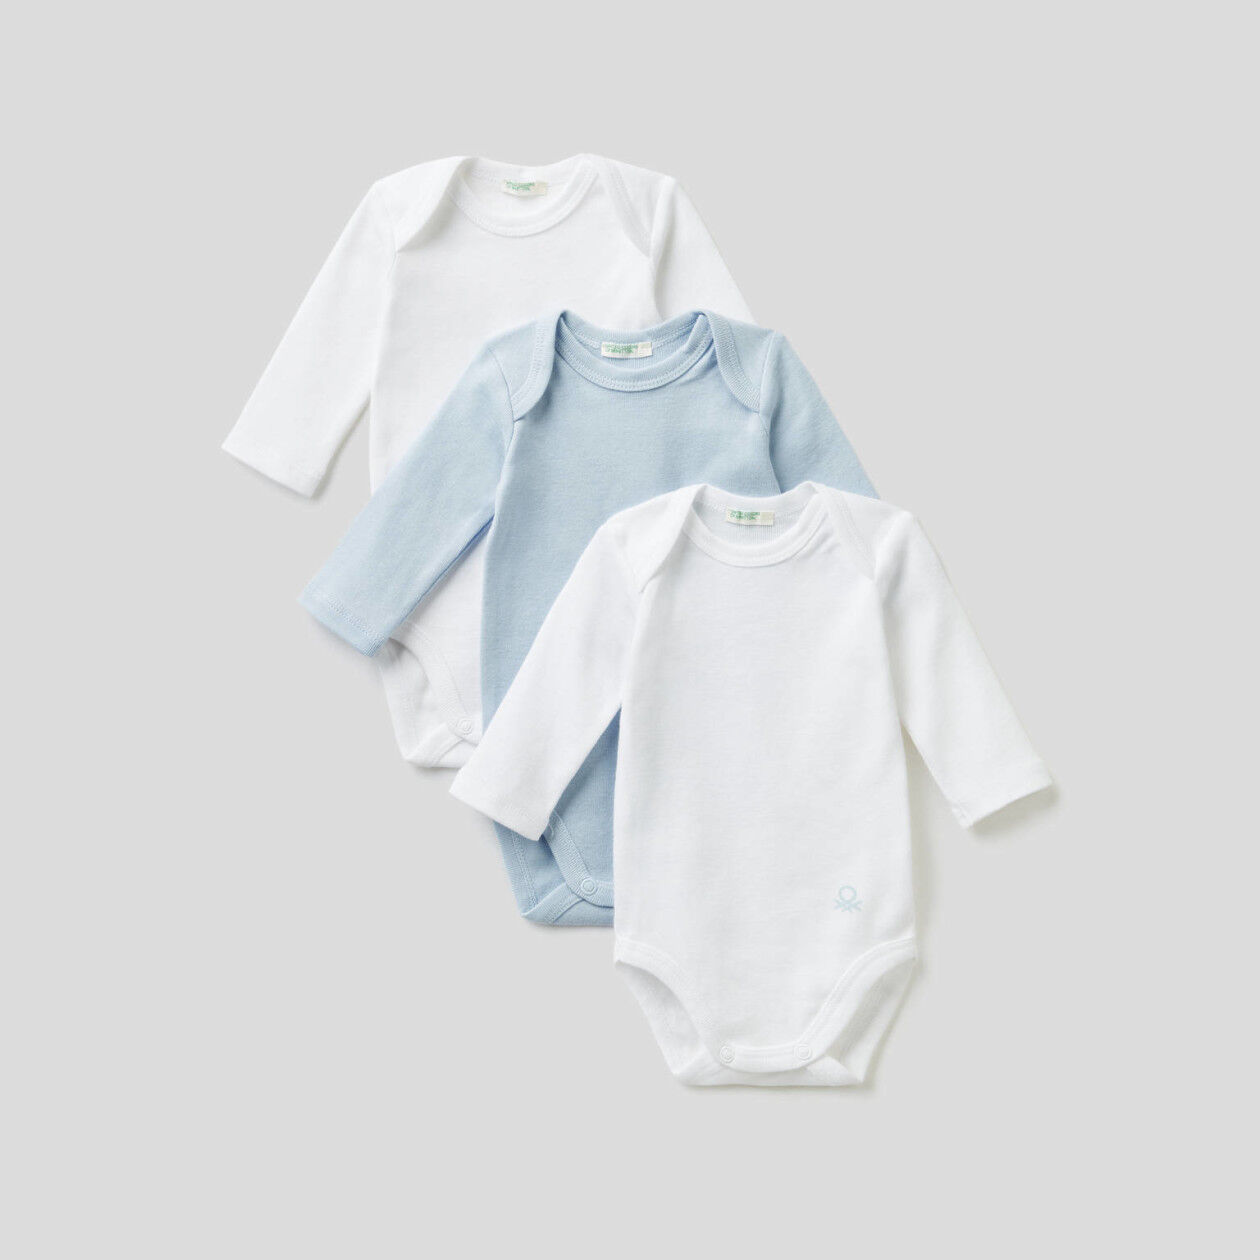 Three organic cotton onesies